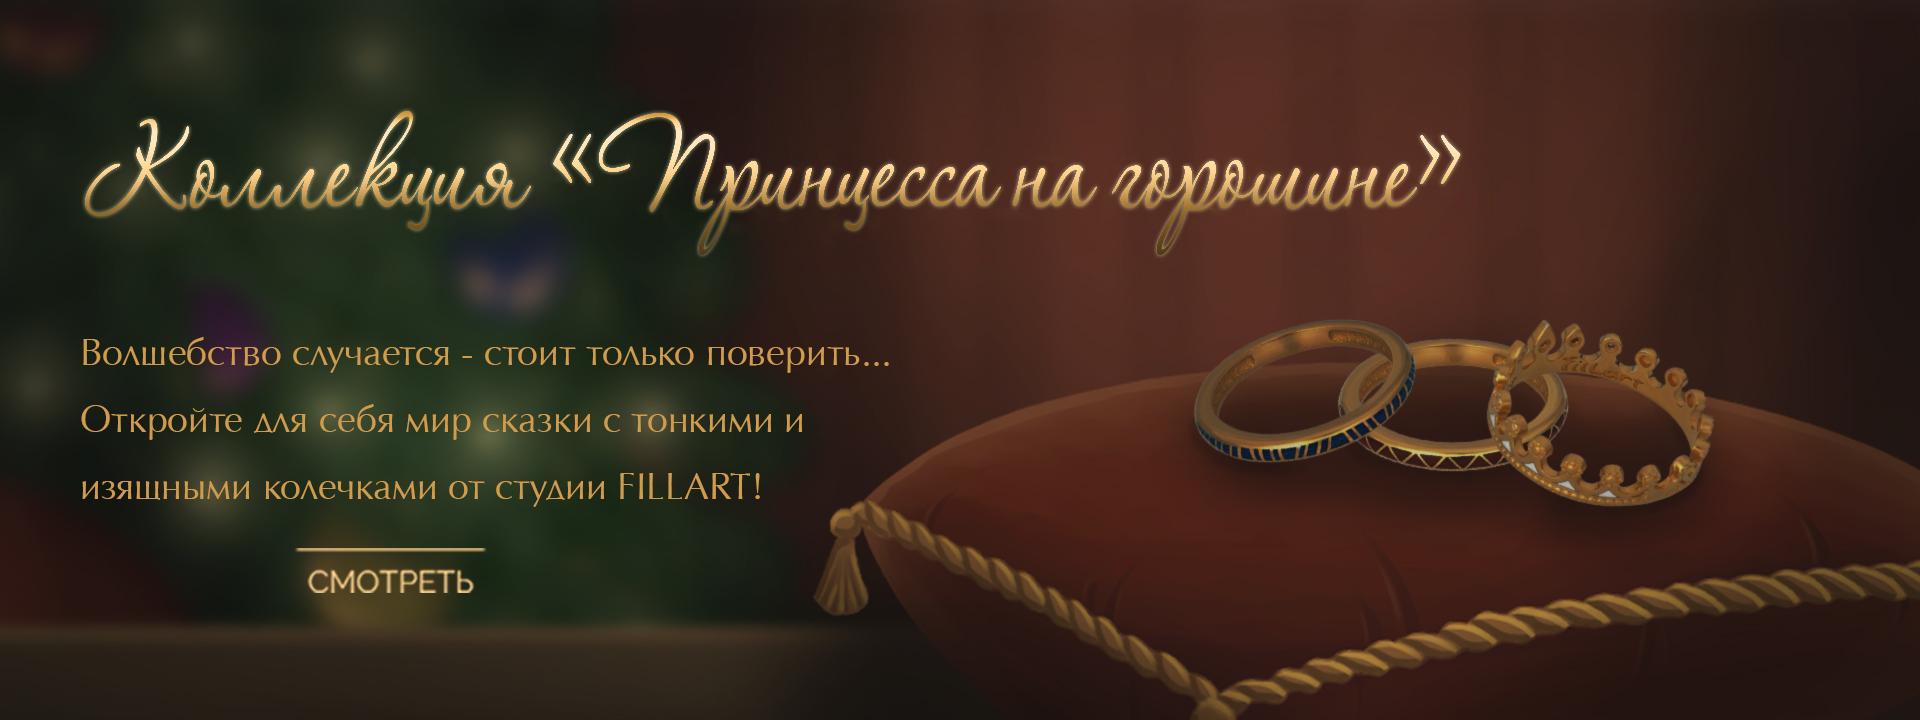 princzessa sajt - Главная